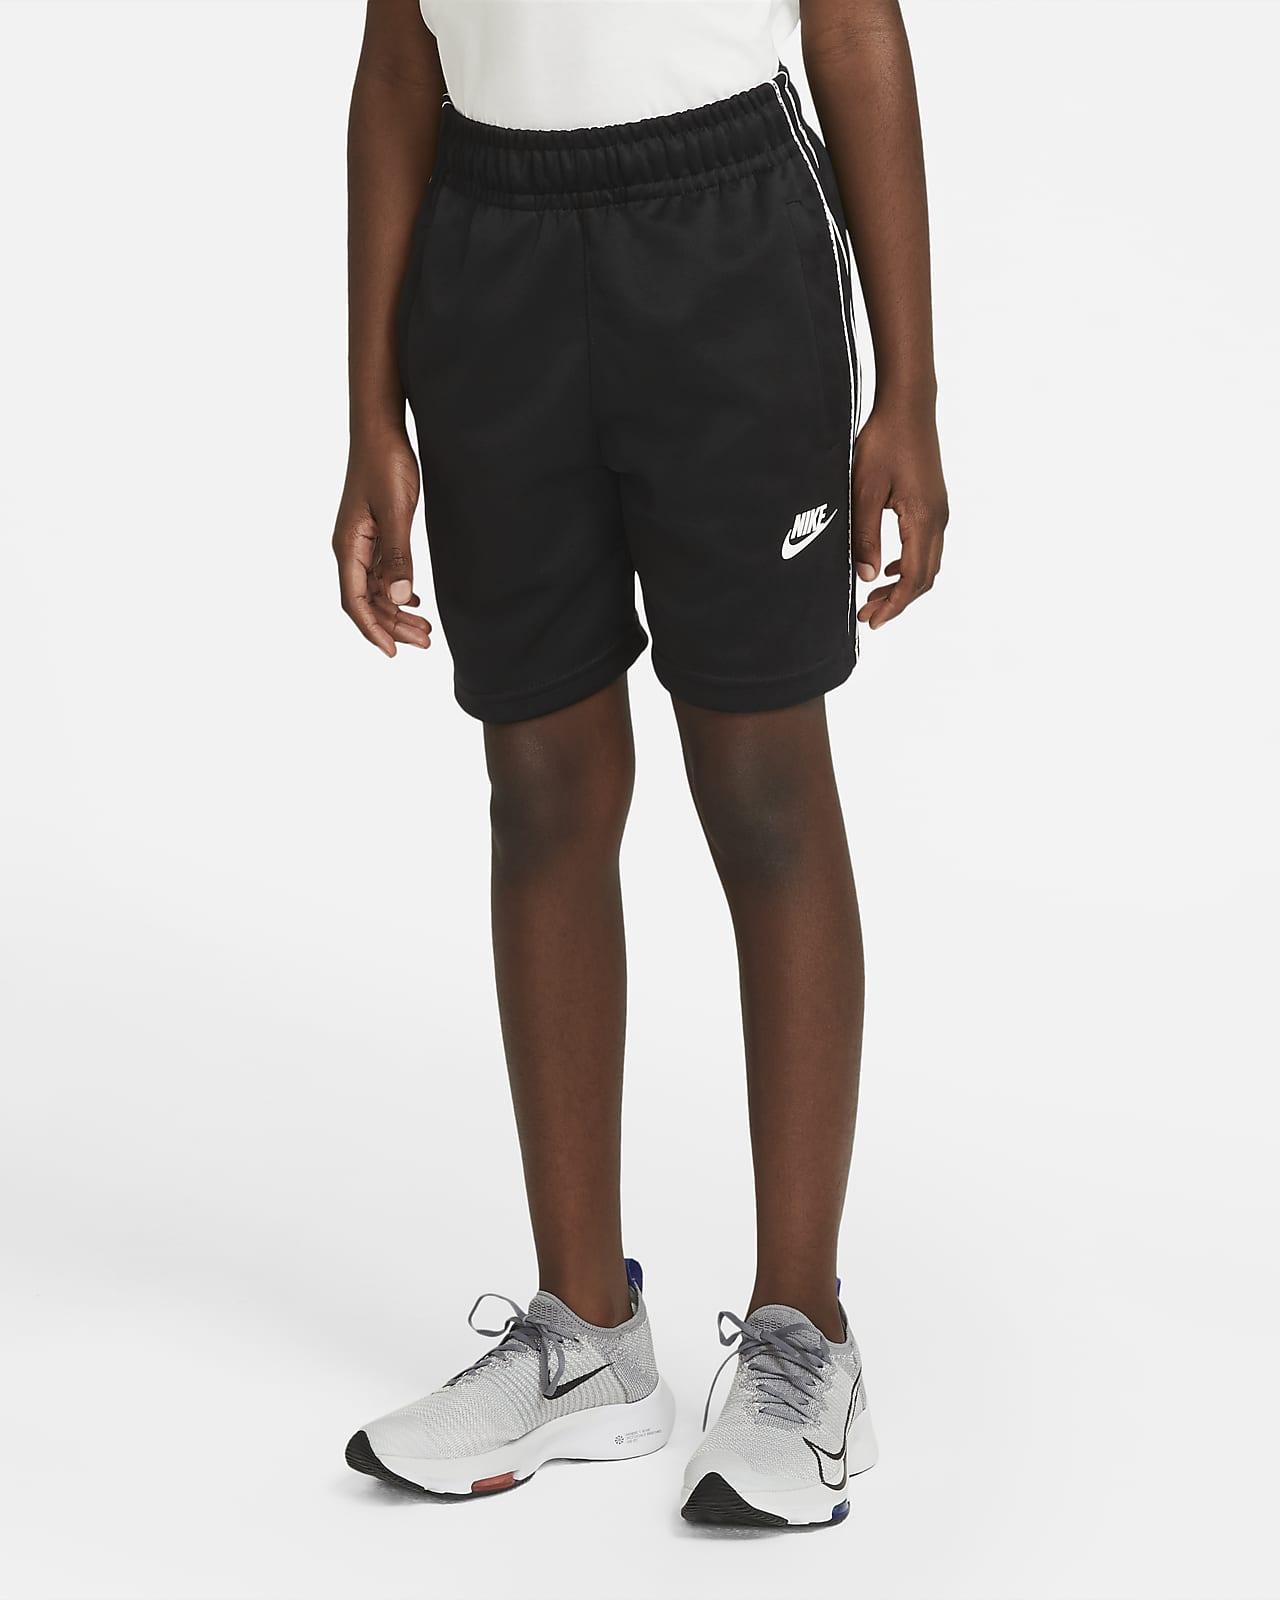 Шорты для мальчиков школьного возраста Nike Sportswear